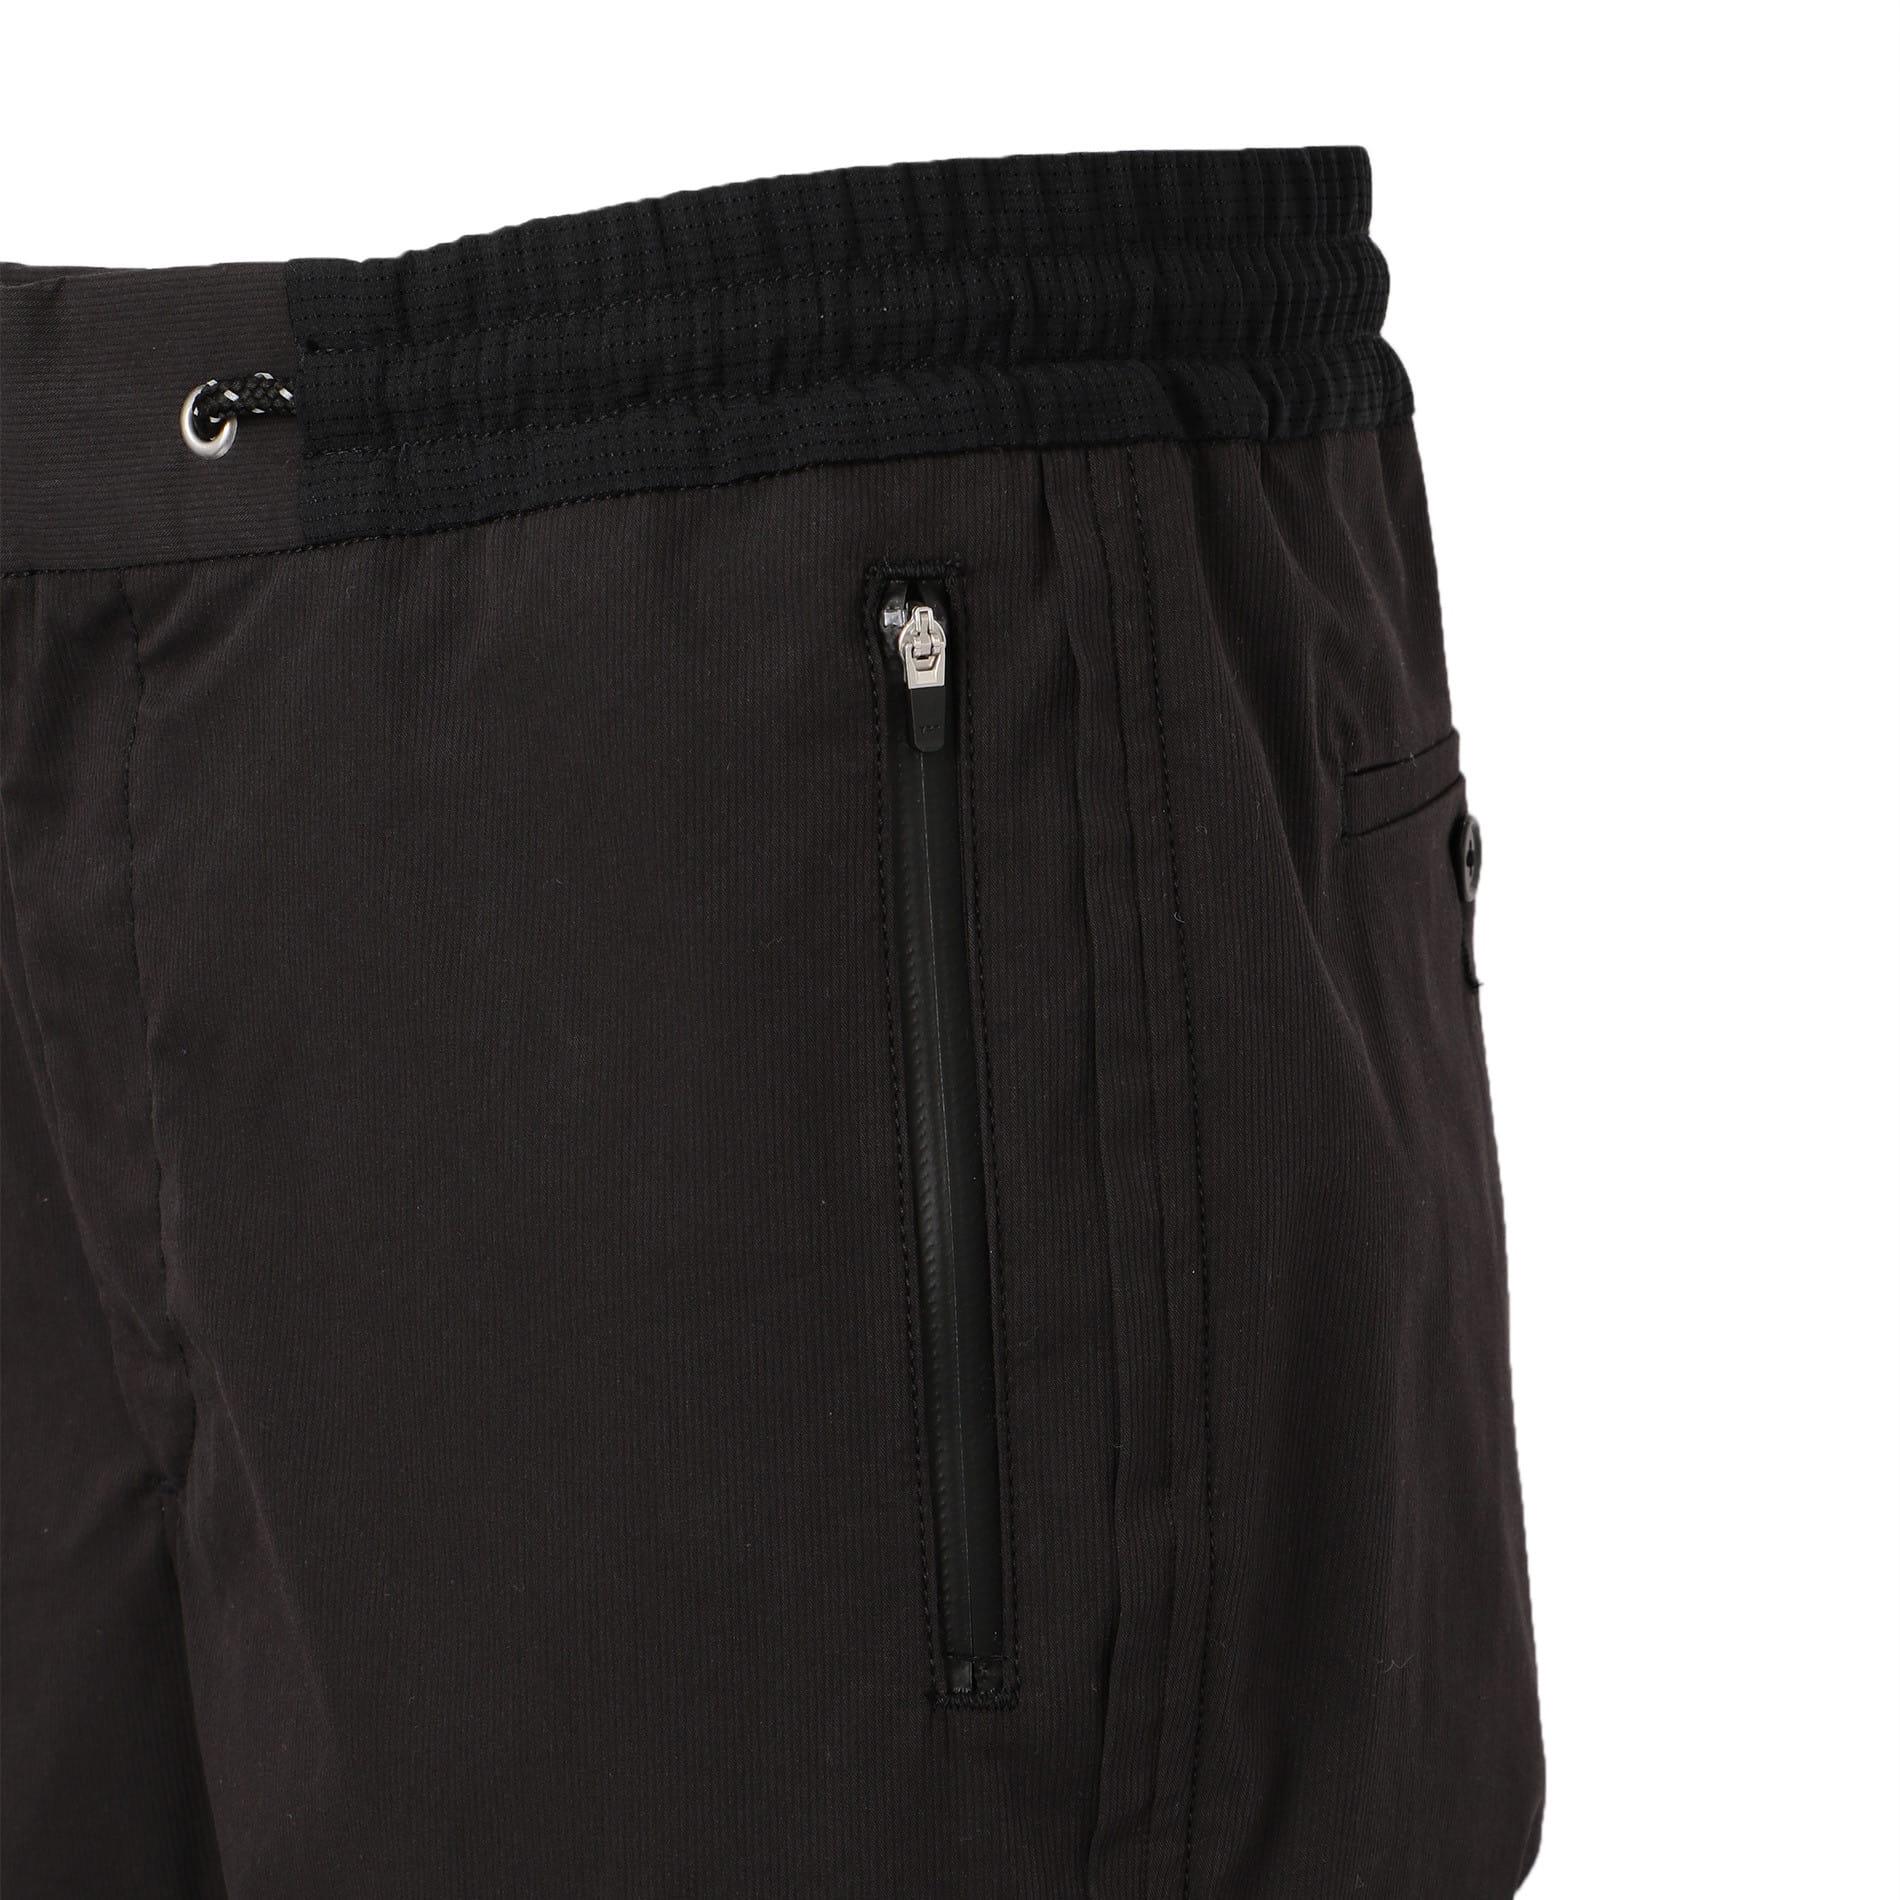 【lideal】MEN パンツ 95291022